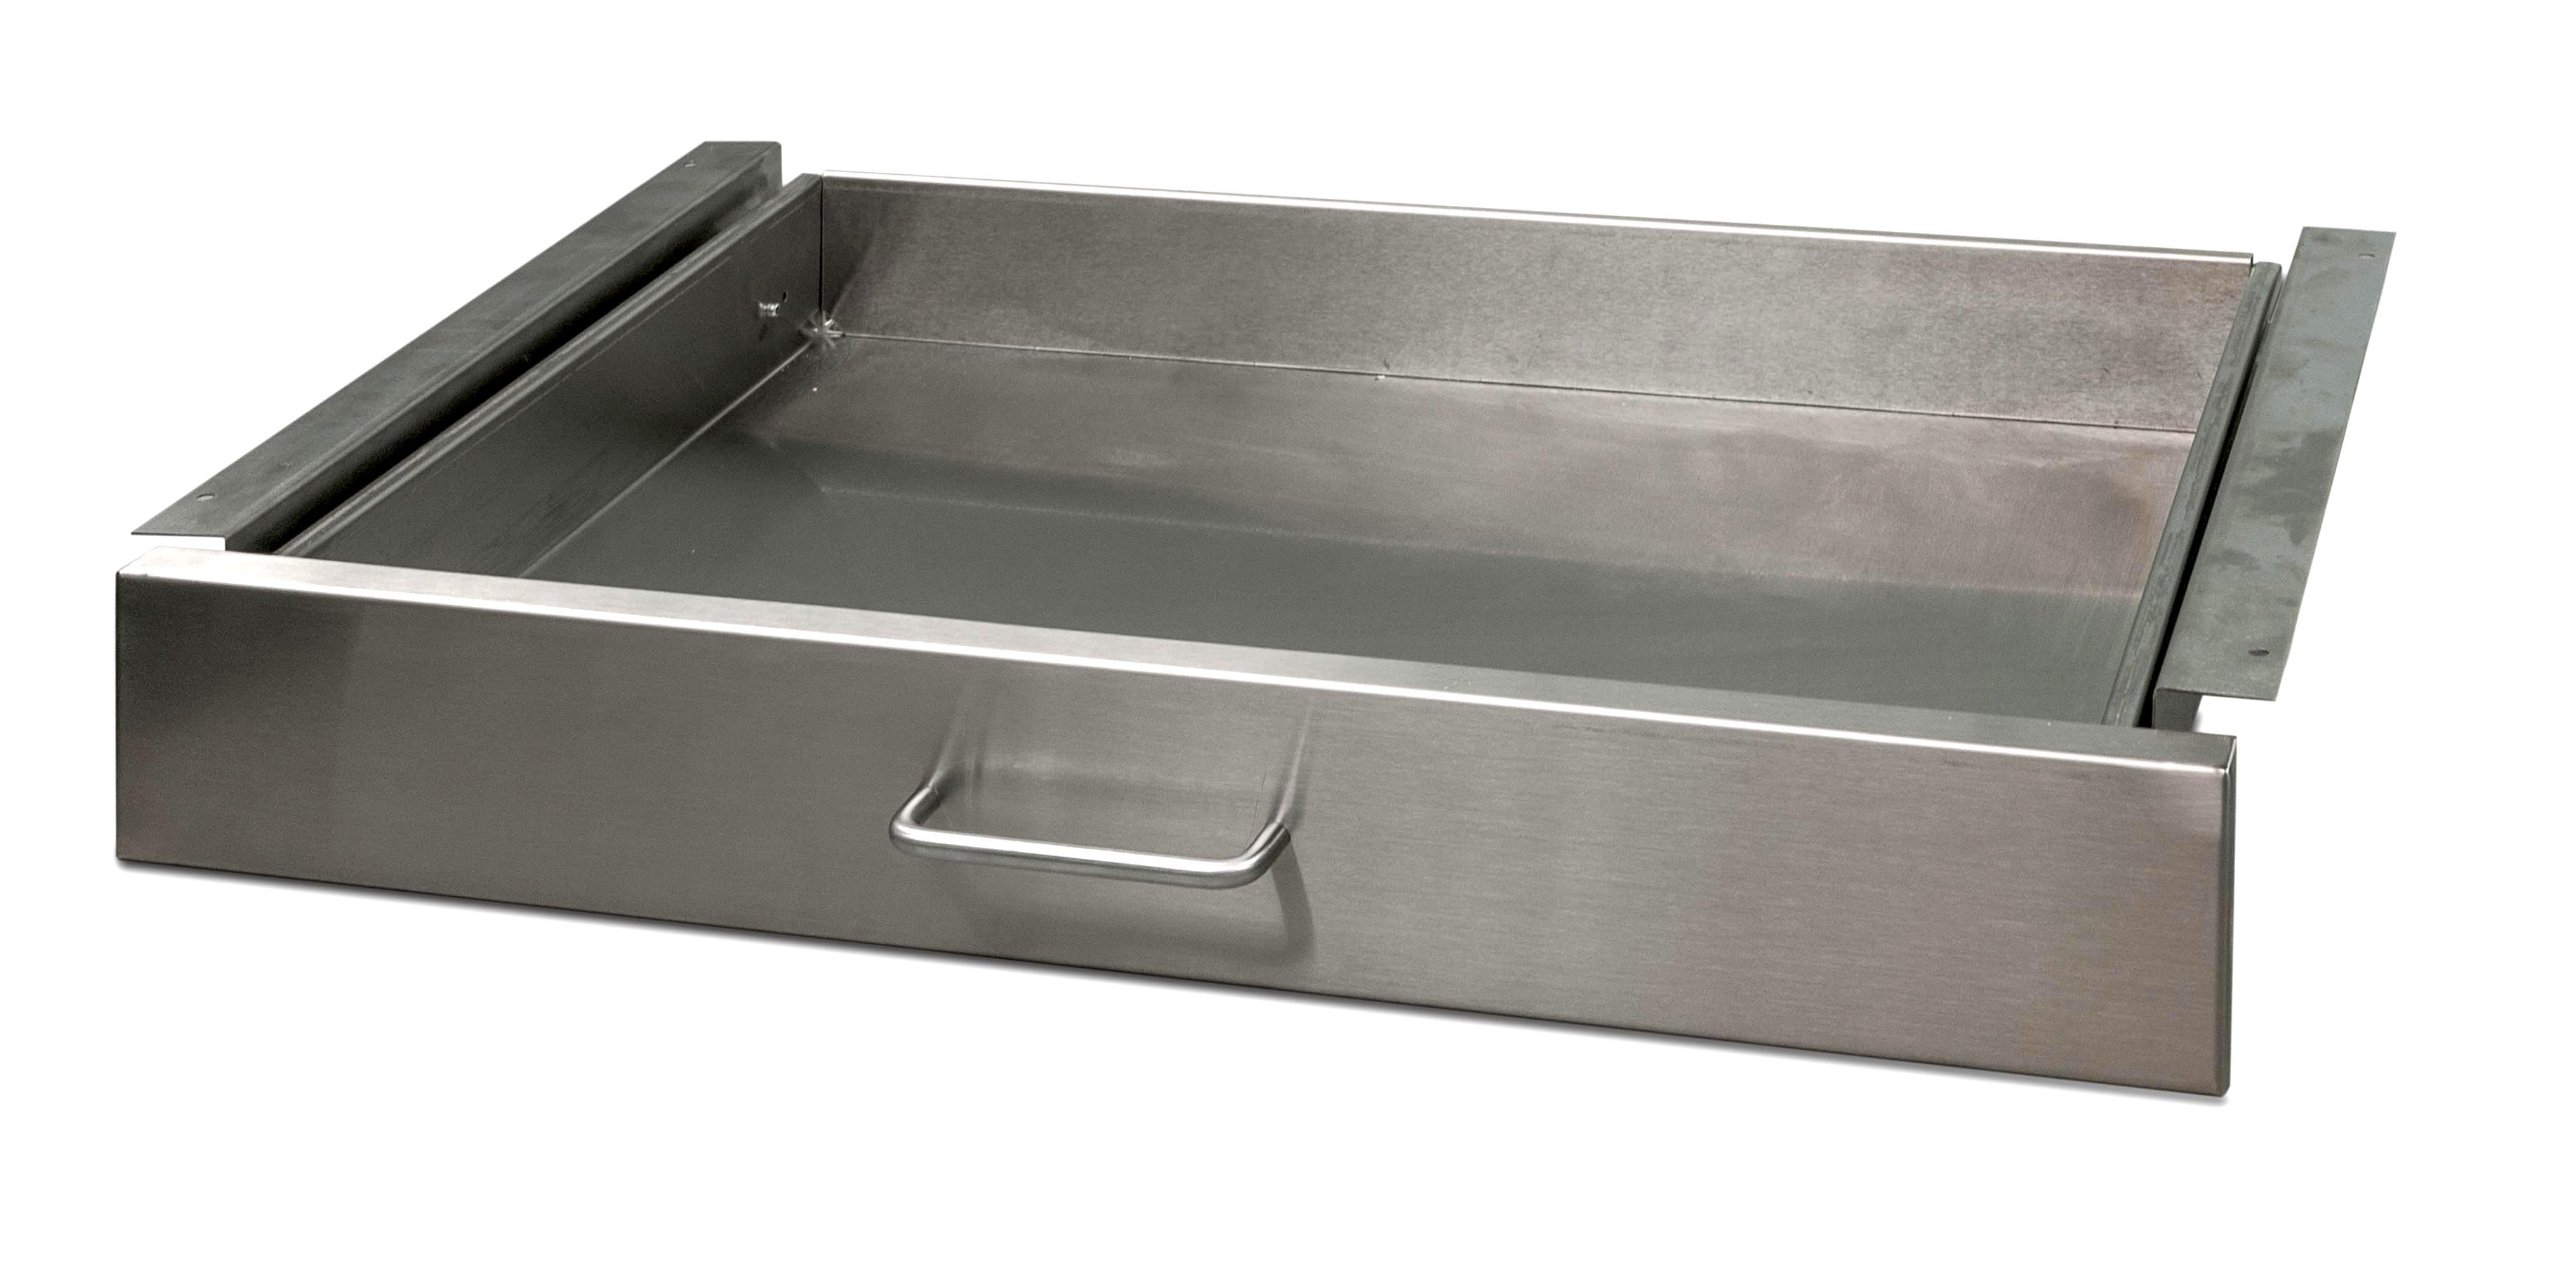 Danver Stainless Steel Kitchen Cart Drawer, 27-Inch